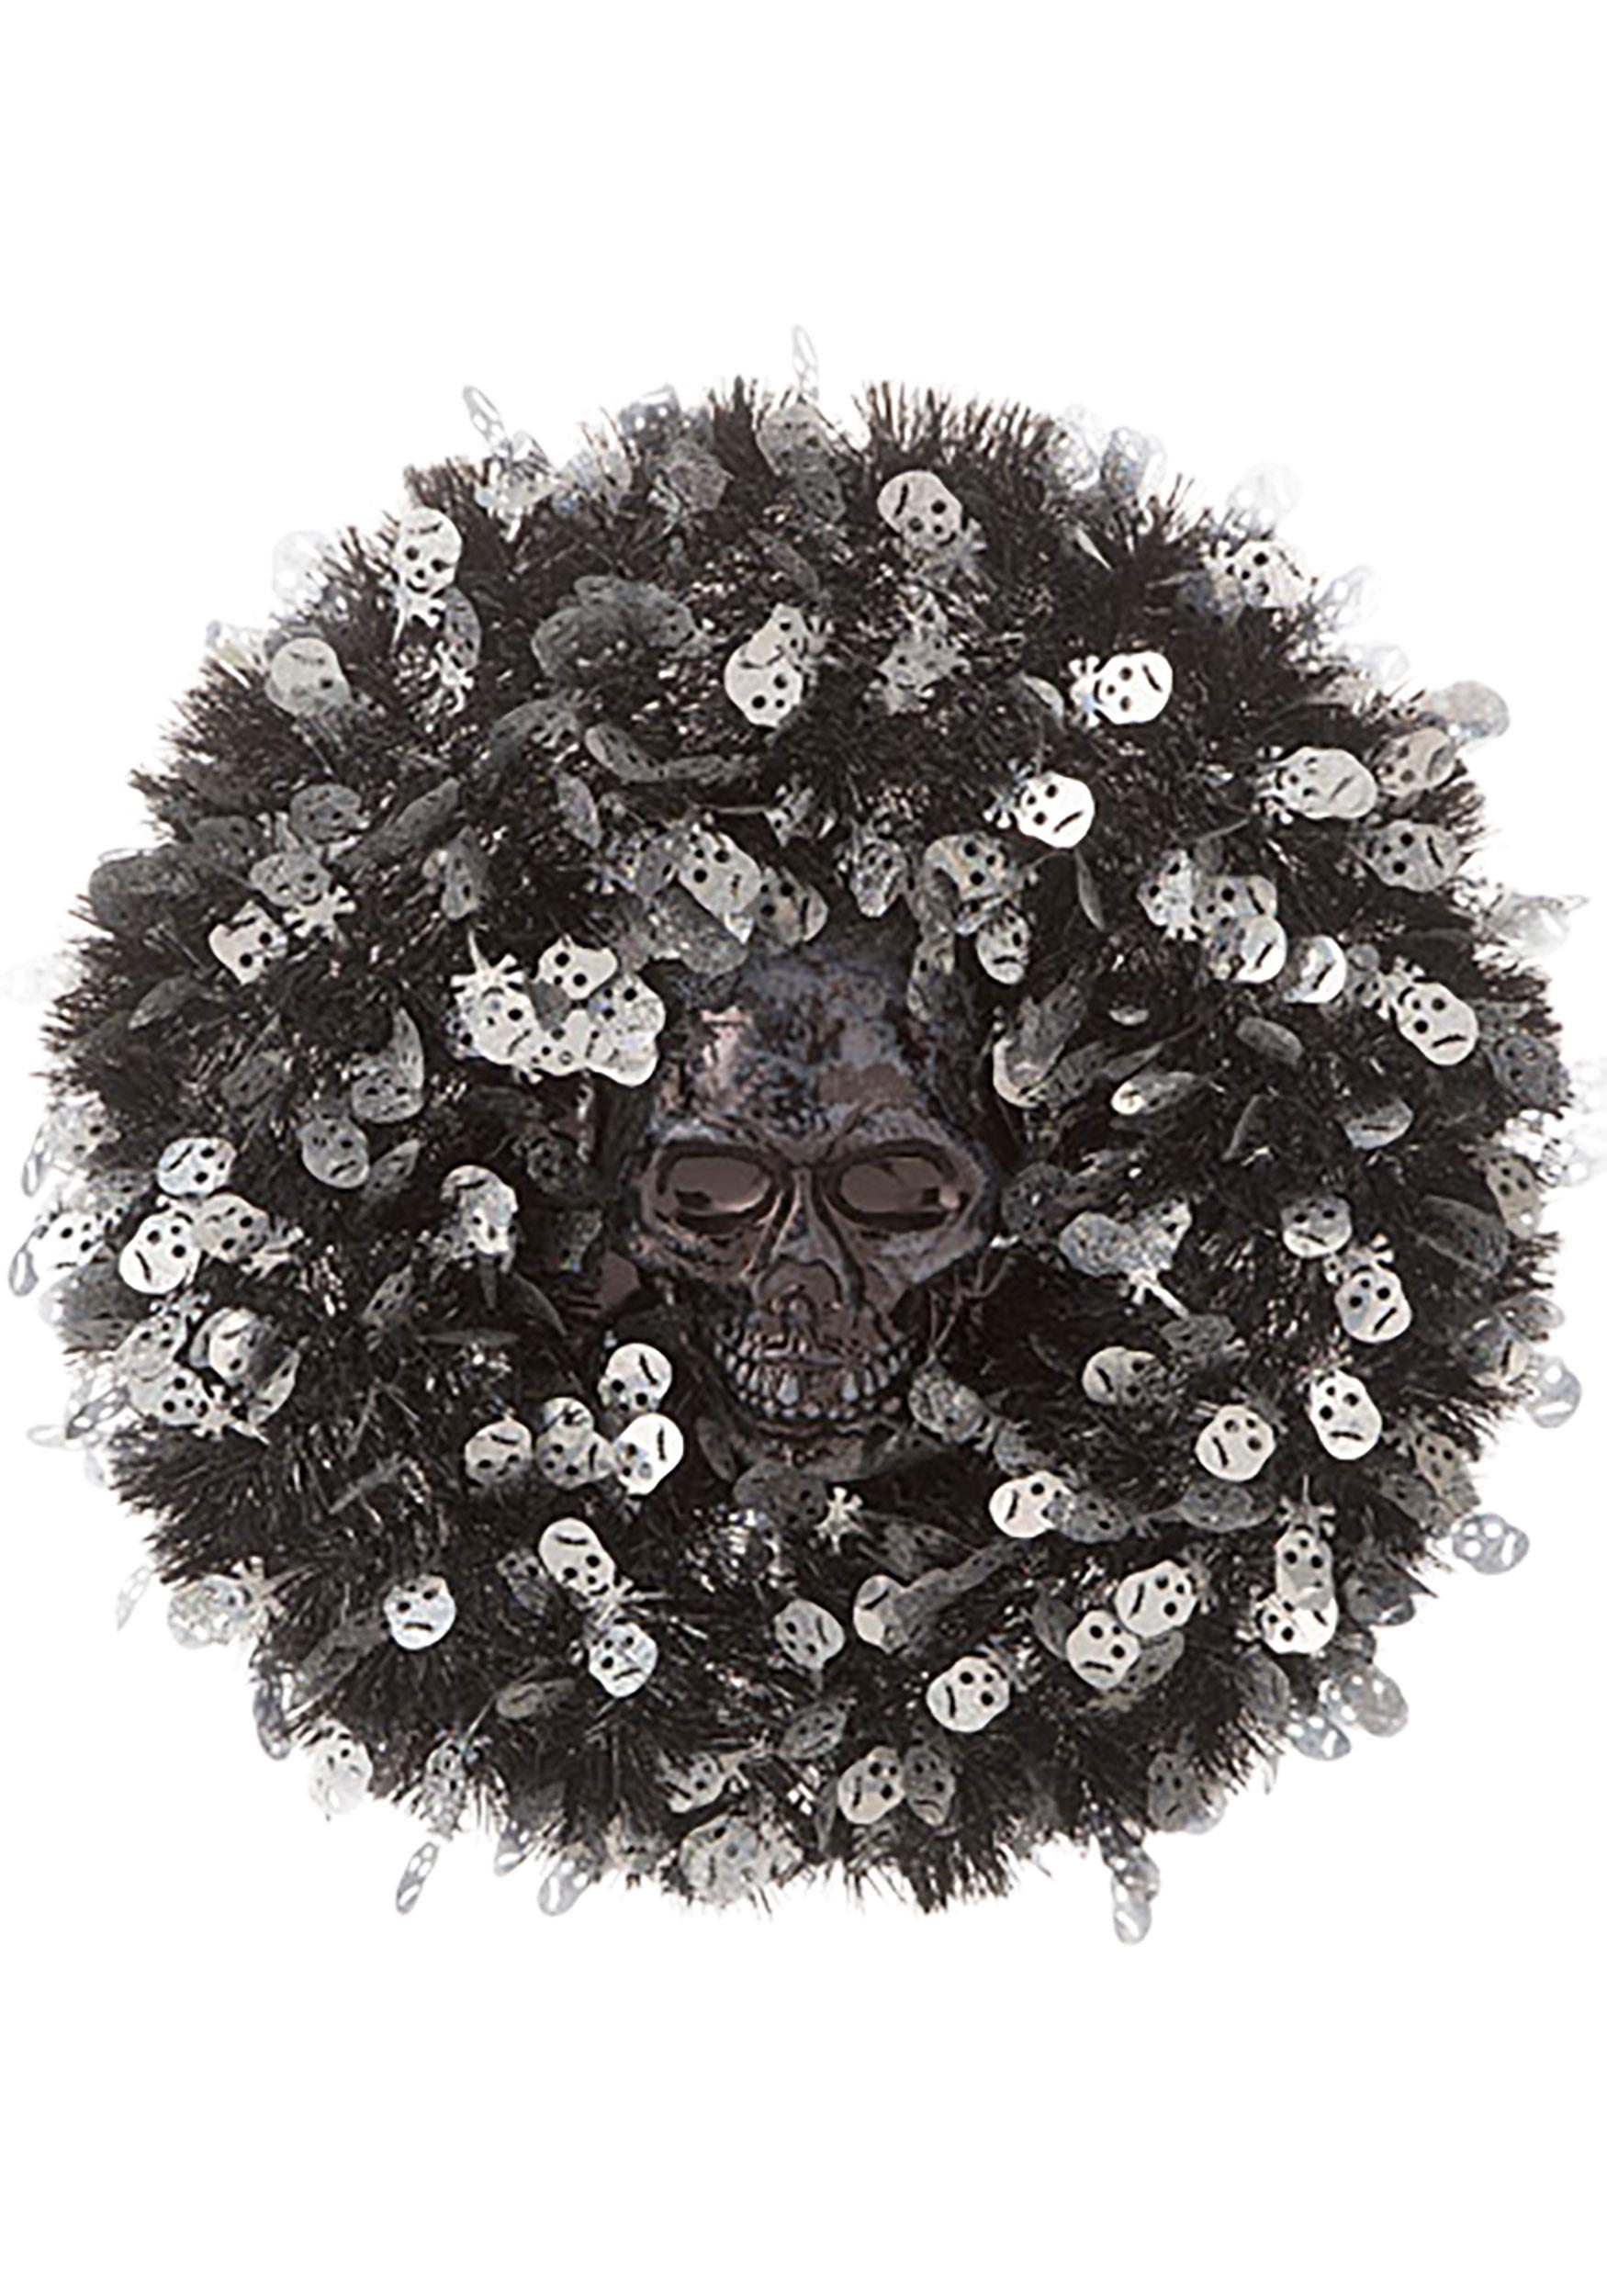 18in Tinsel Skull Halloween Wreath